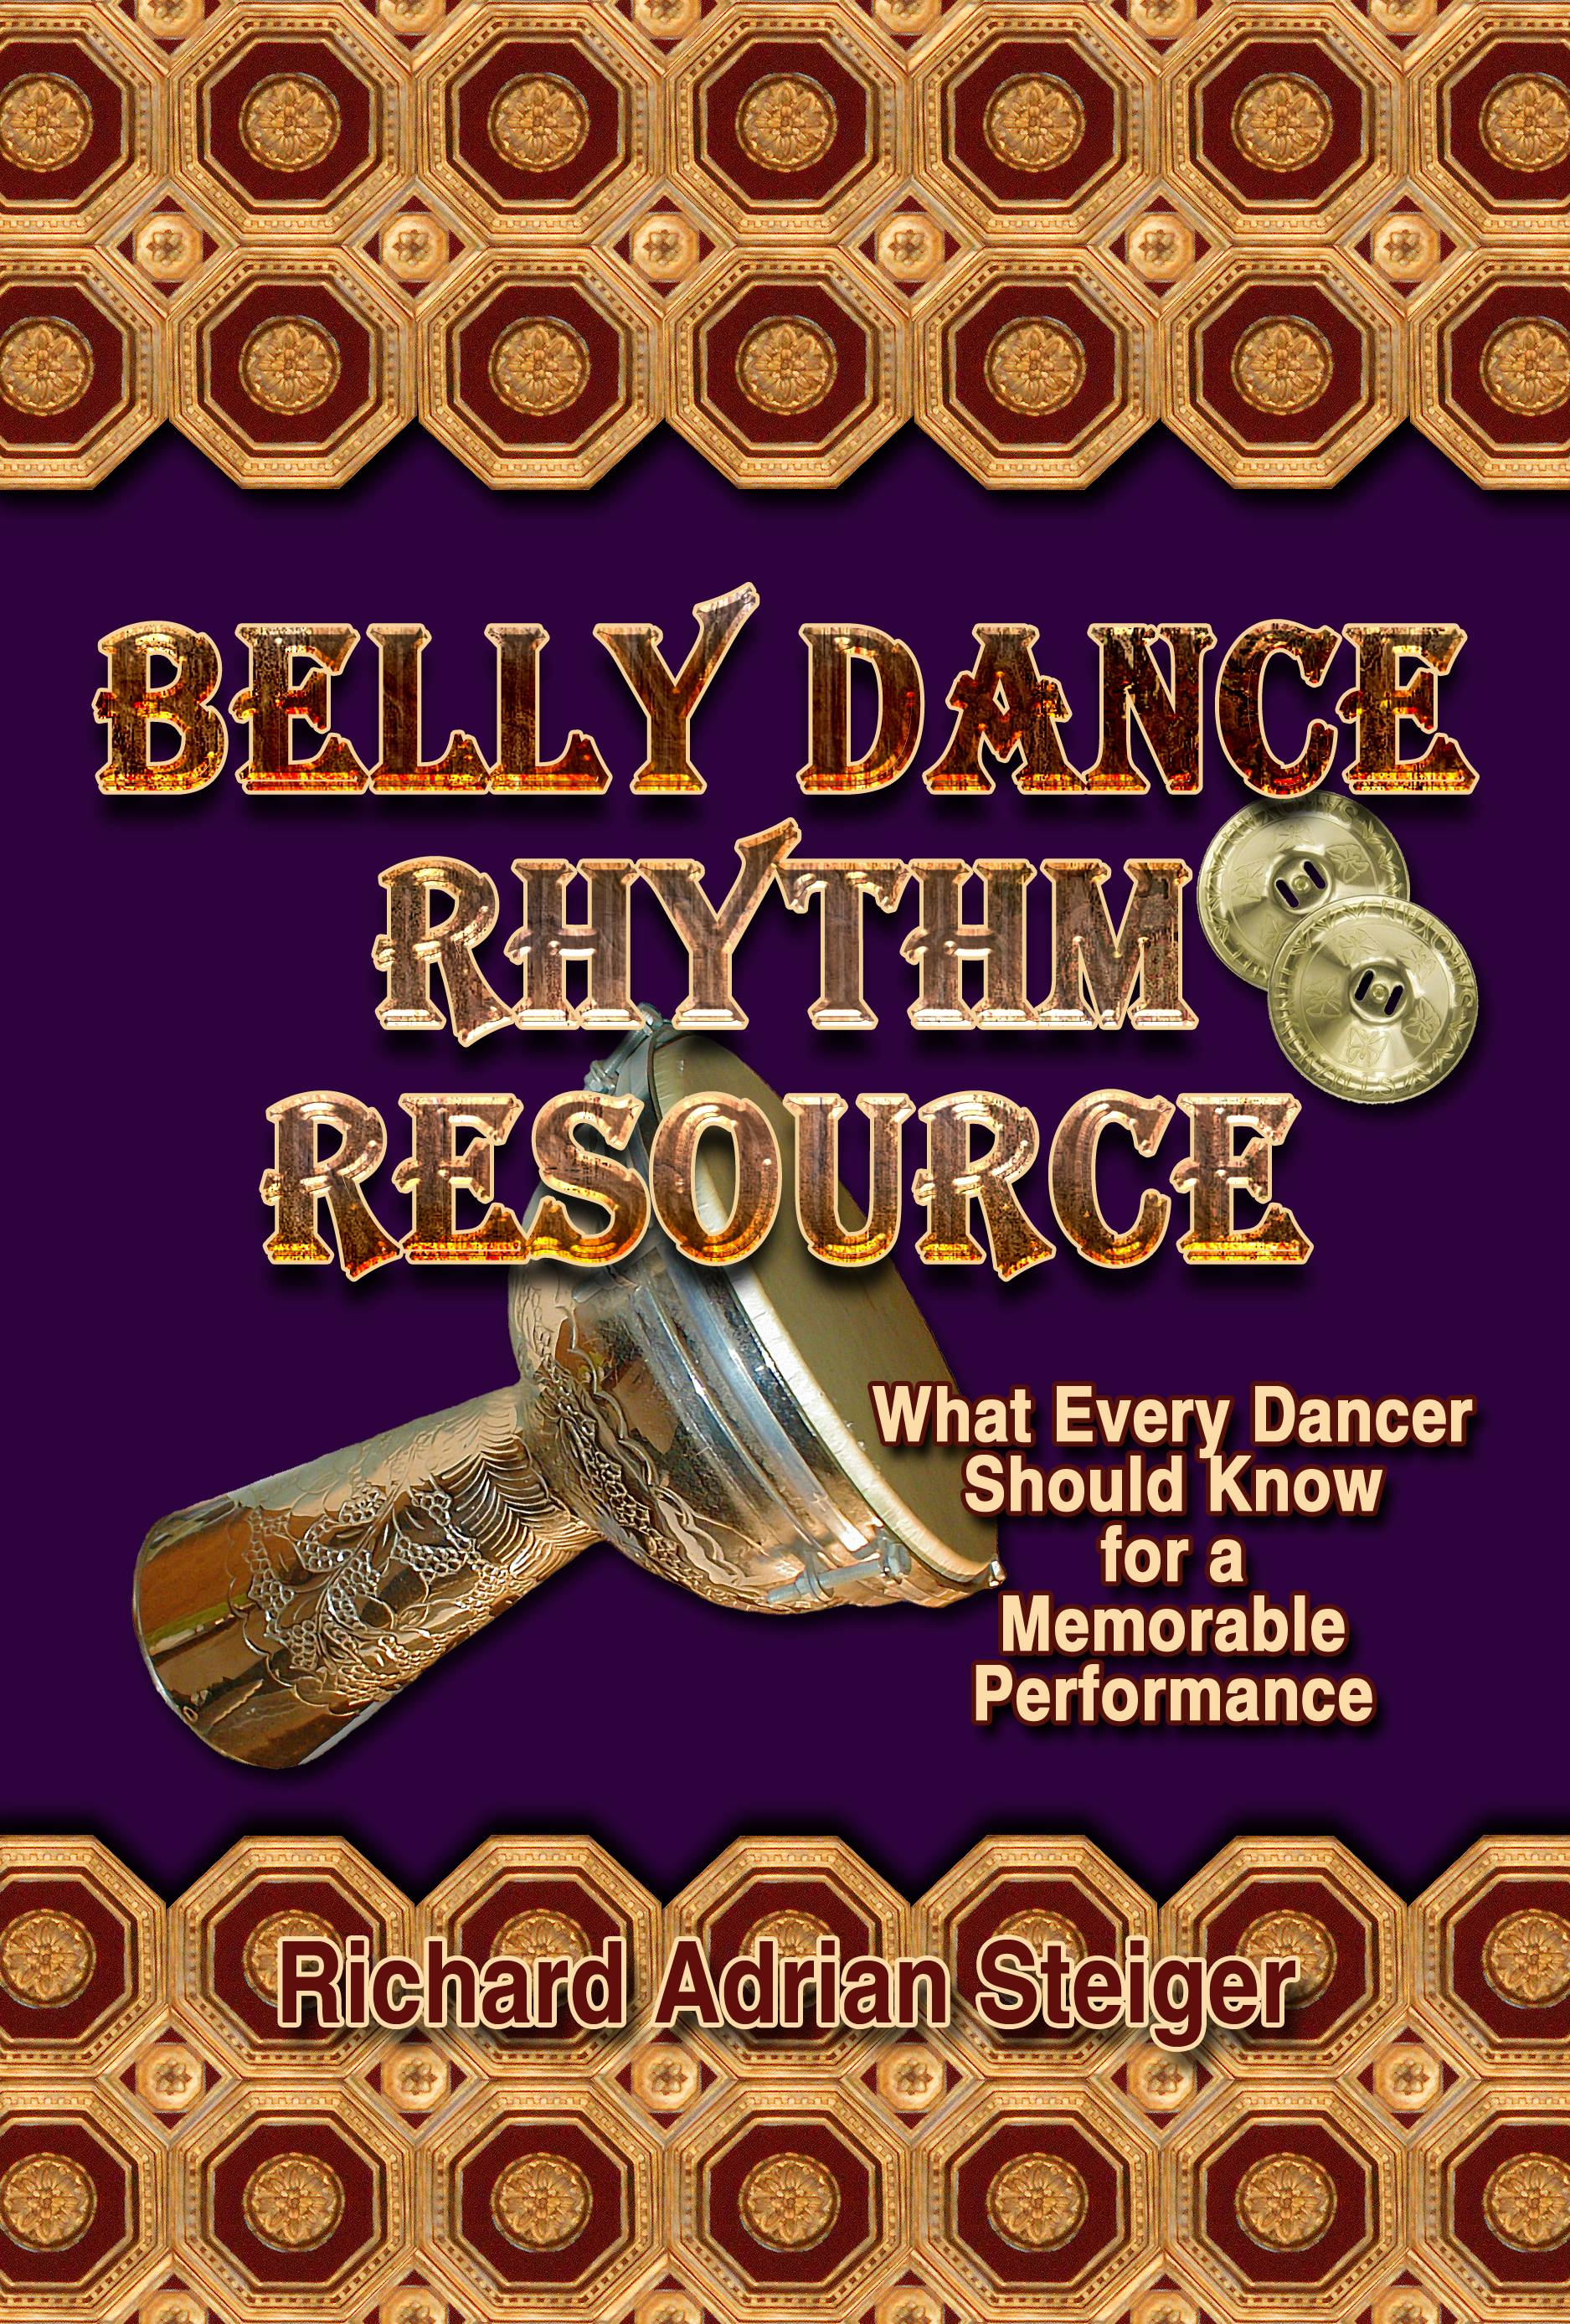 Belly Dance Rhythm Resource.  Available @ Amazon: https://www.amazon.com/Books-Richard-Adrian-Steiger